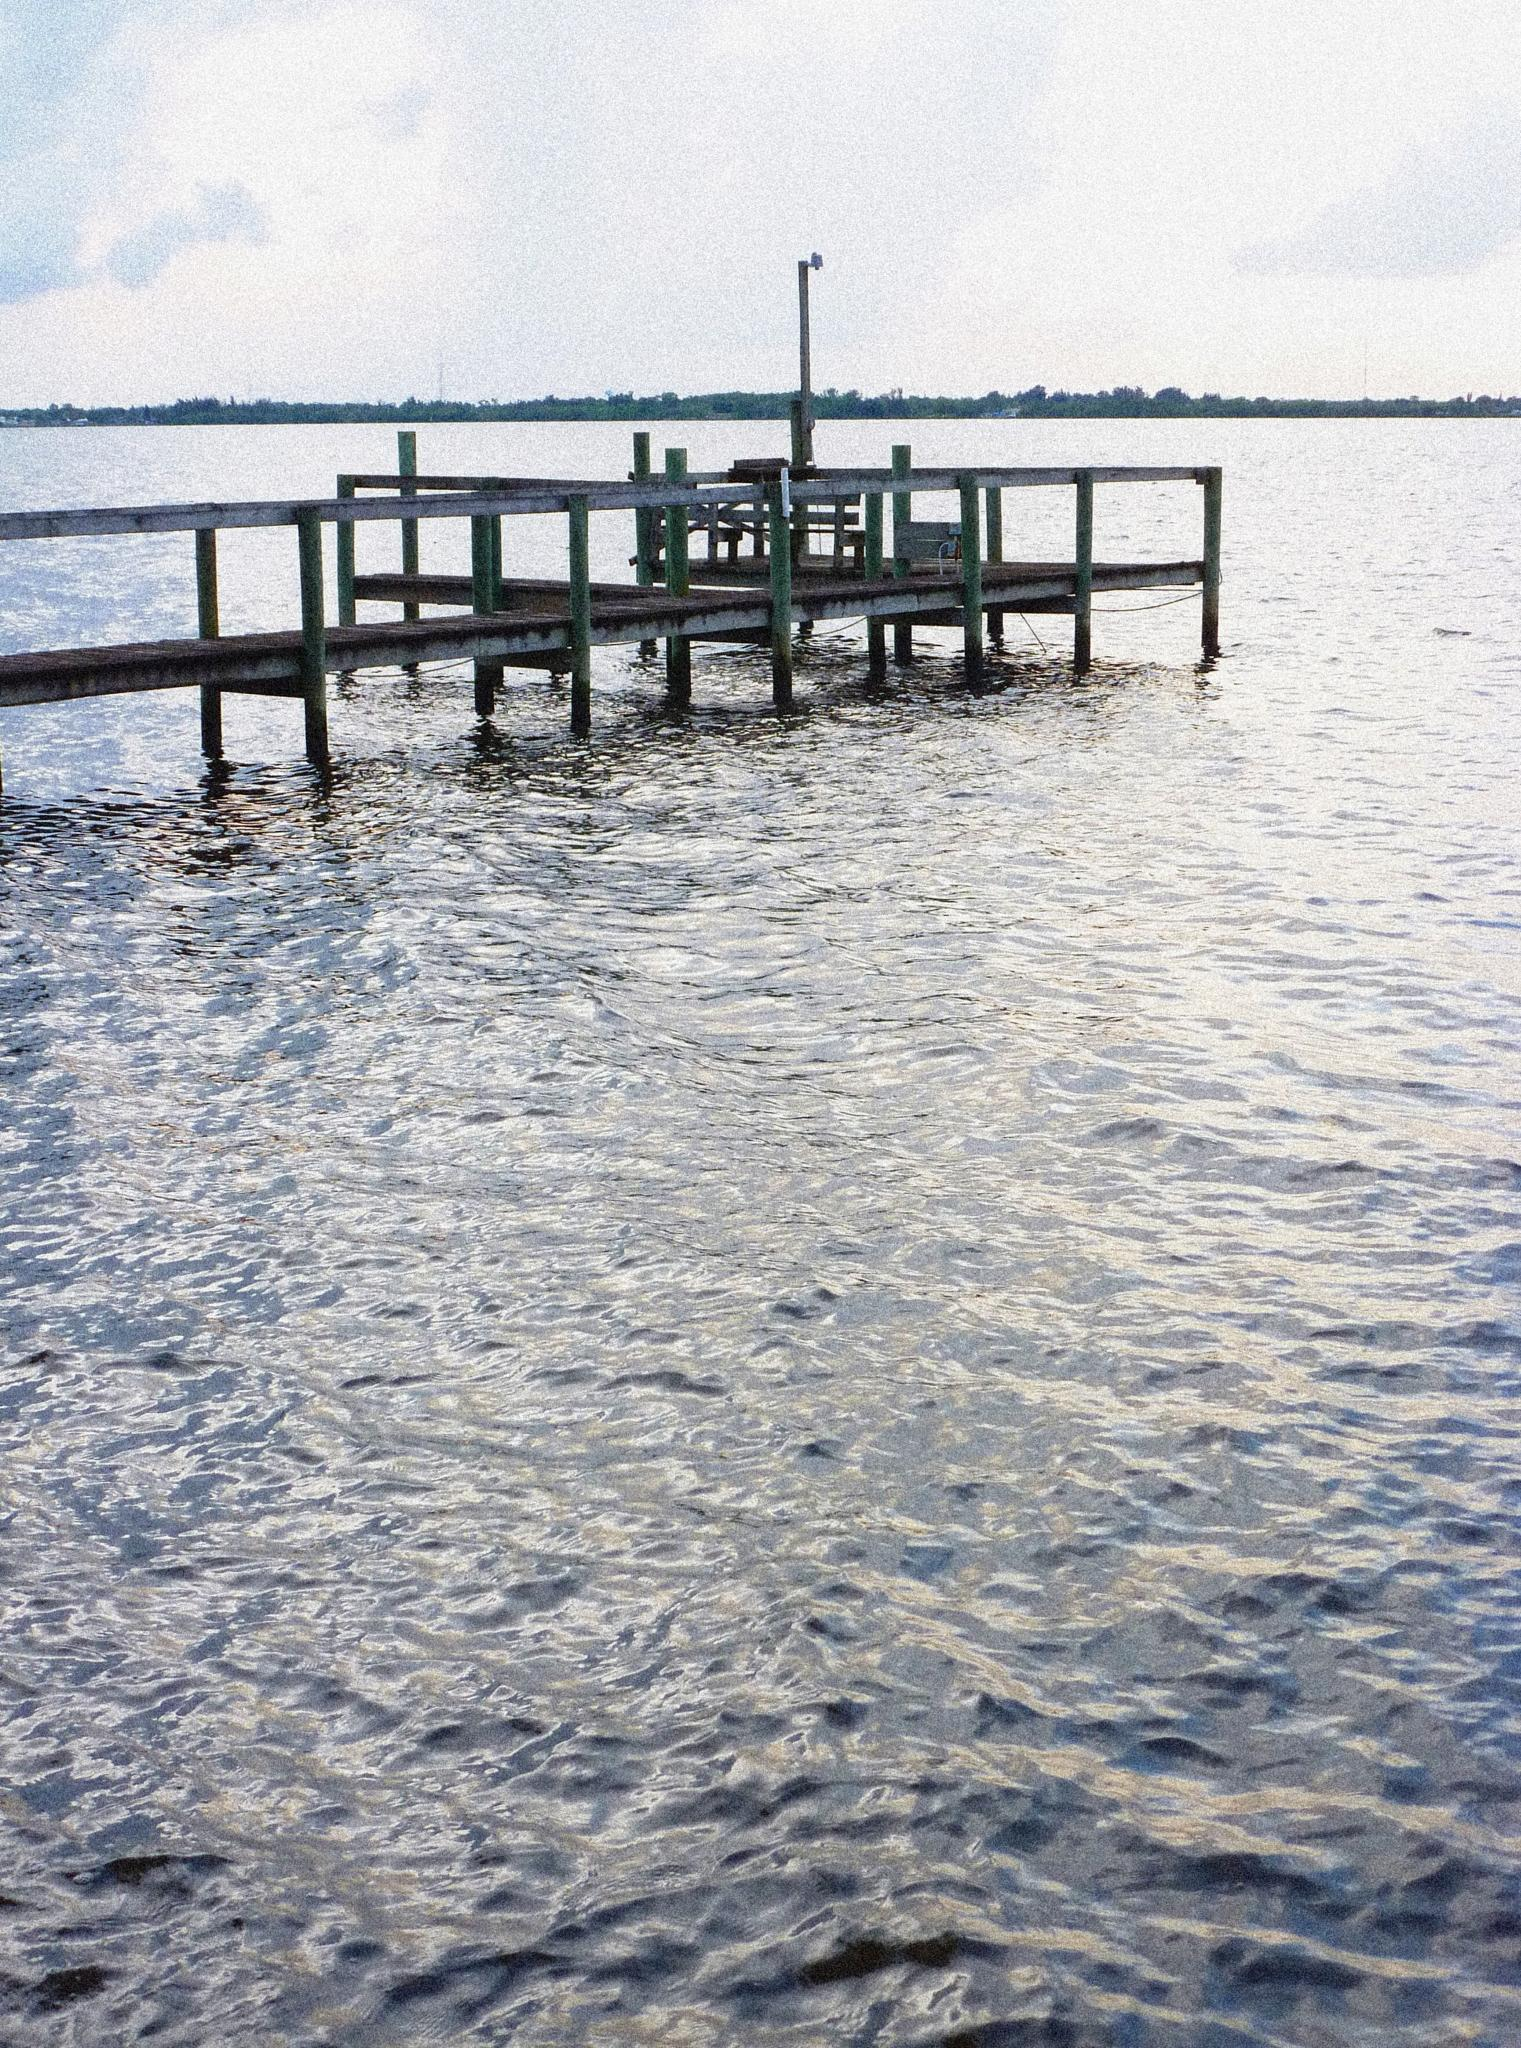 Damaged Pier, Caloosahatchee River by downwindpassage